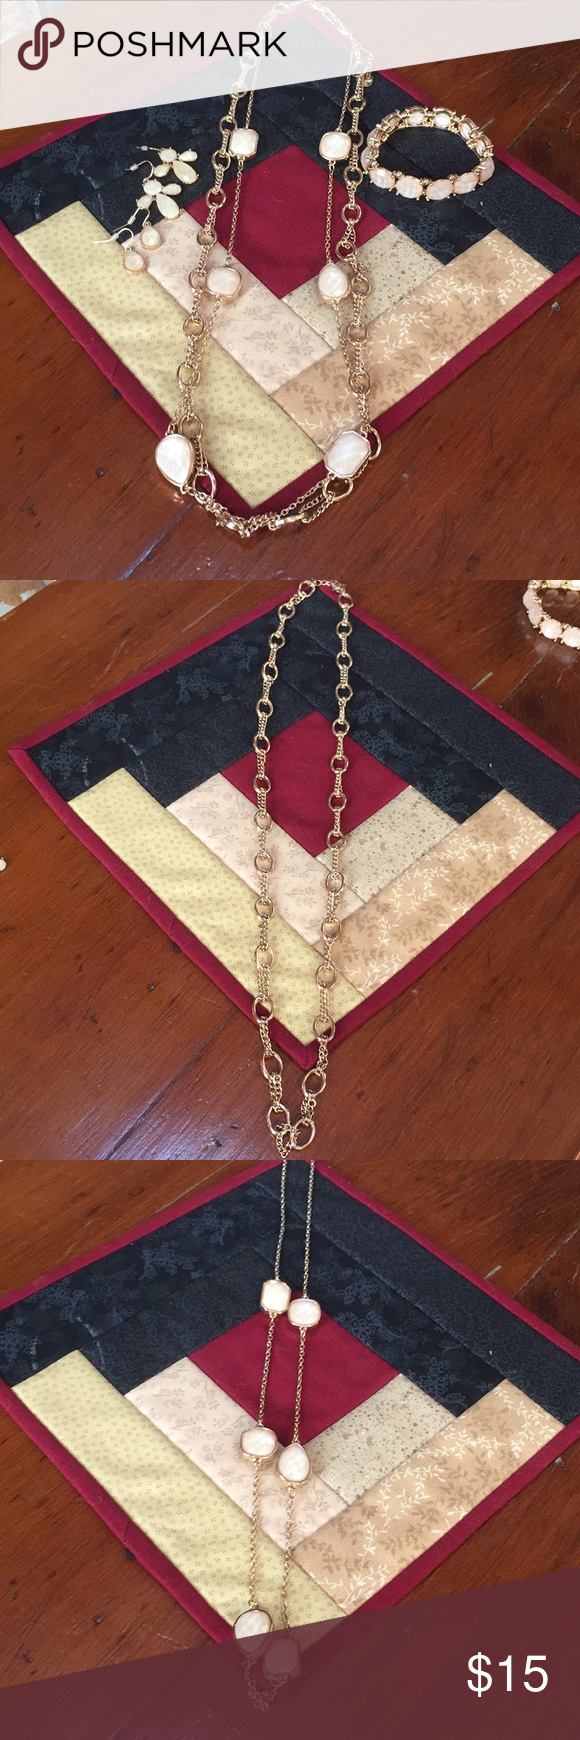 Gold necklace bracelet u earring set gold necklaces compliments